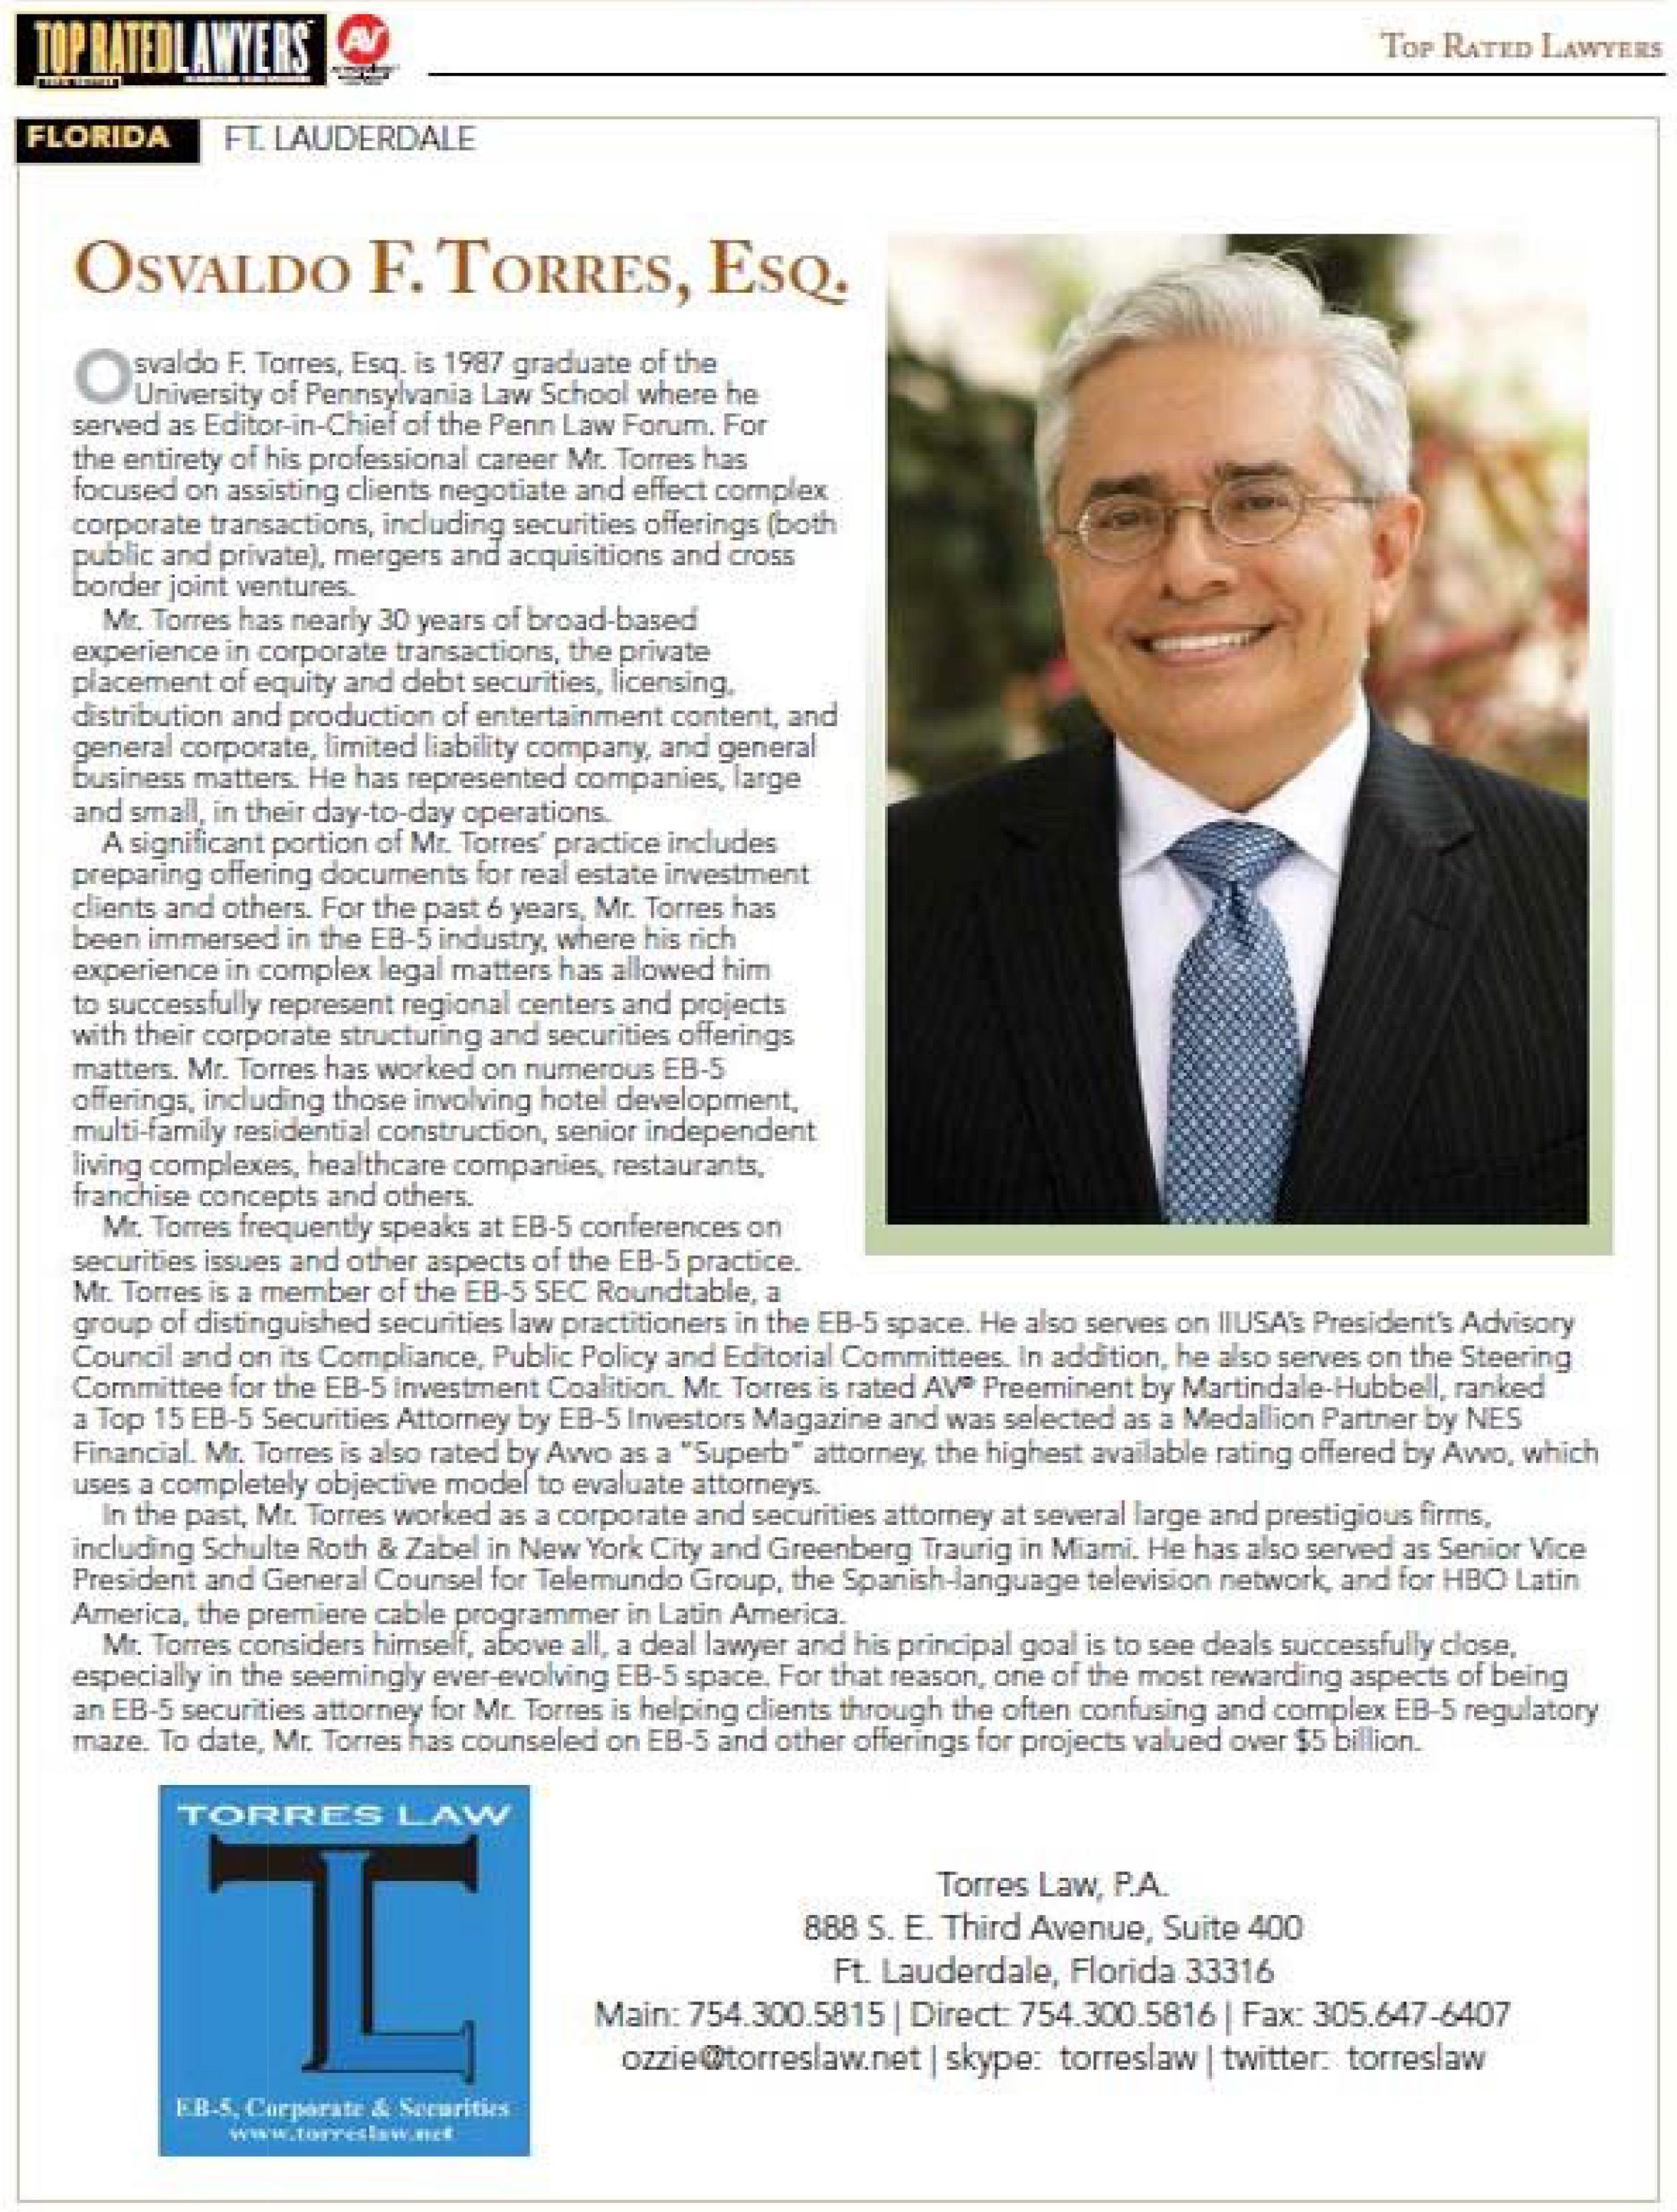 Osvaldo Torres featured in Top Lawyers